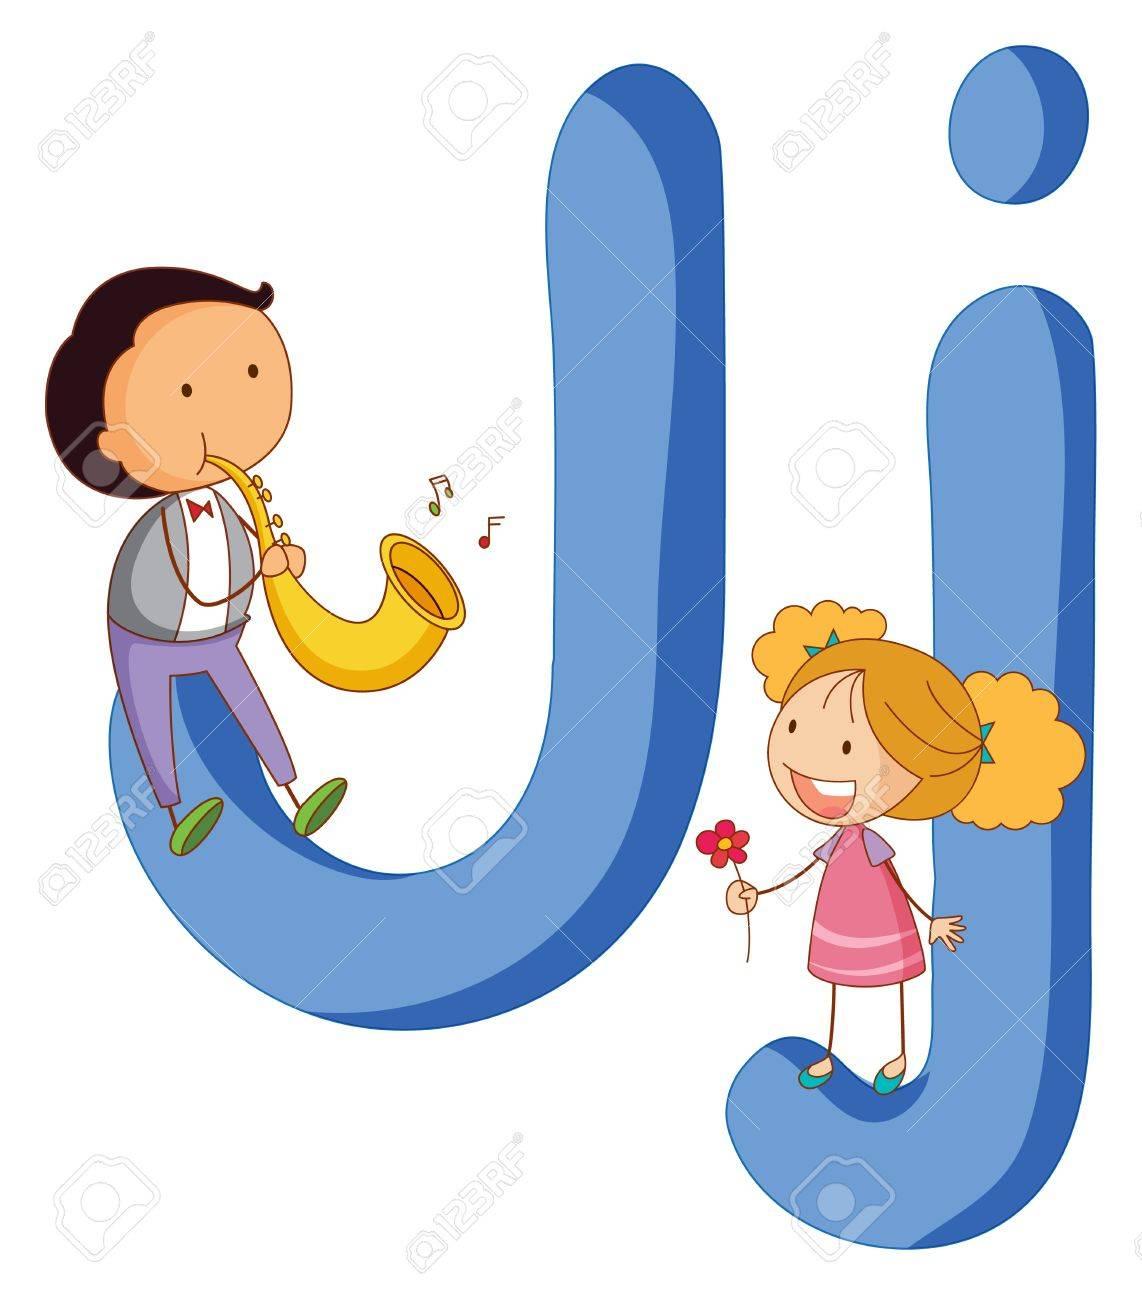 Illustration of children in a letter of alphabet Stock Vector - 14887333